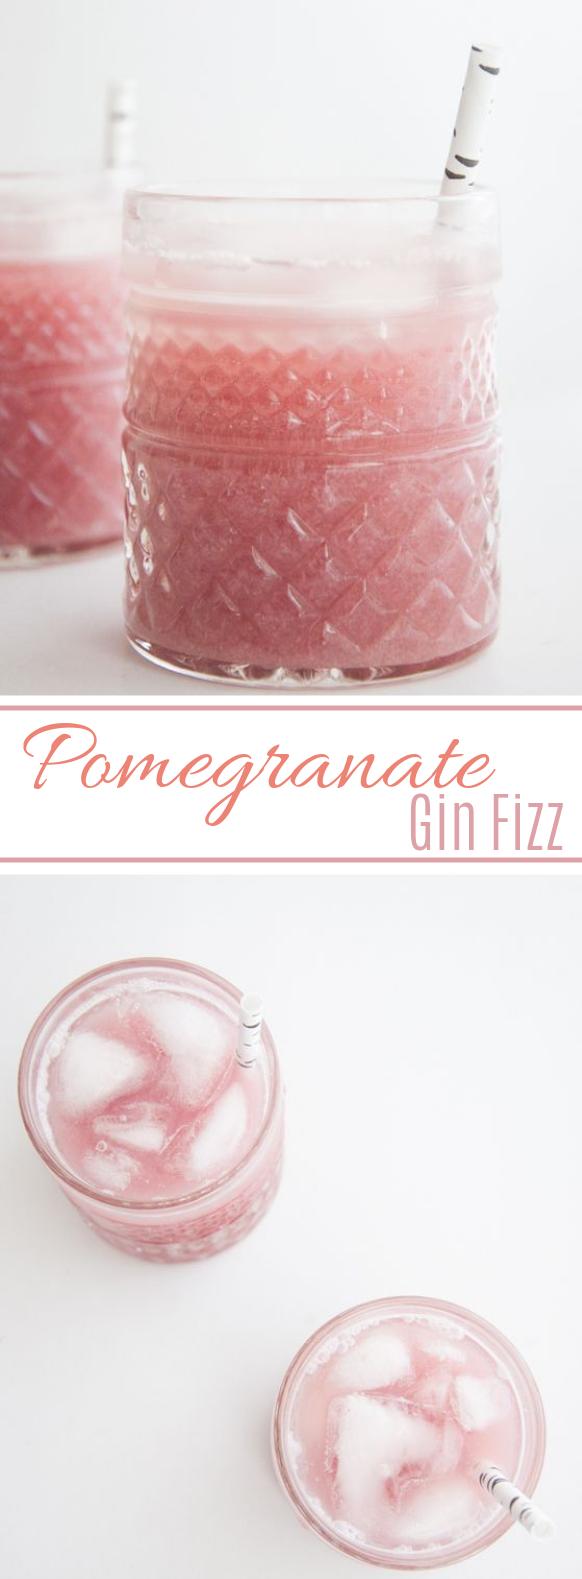 Pomegranate Gin Fizz #valentine's #drink